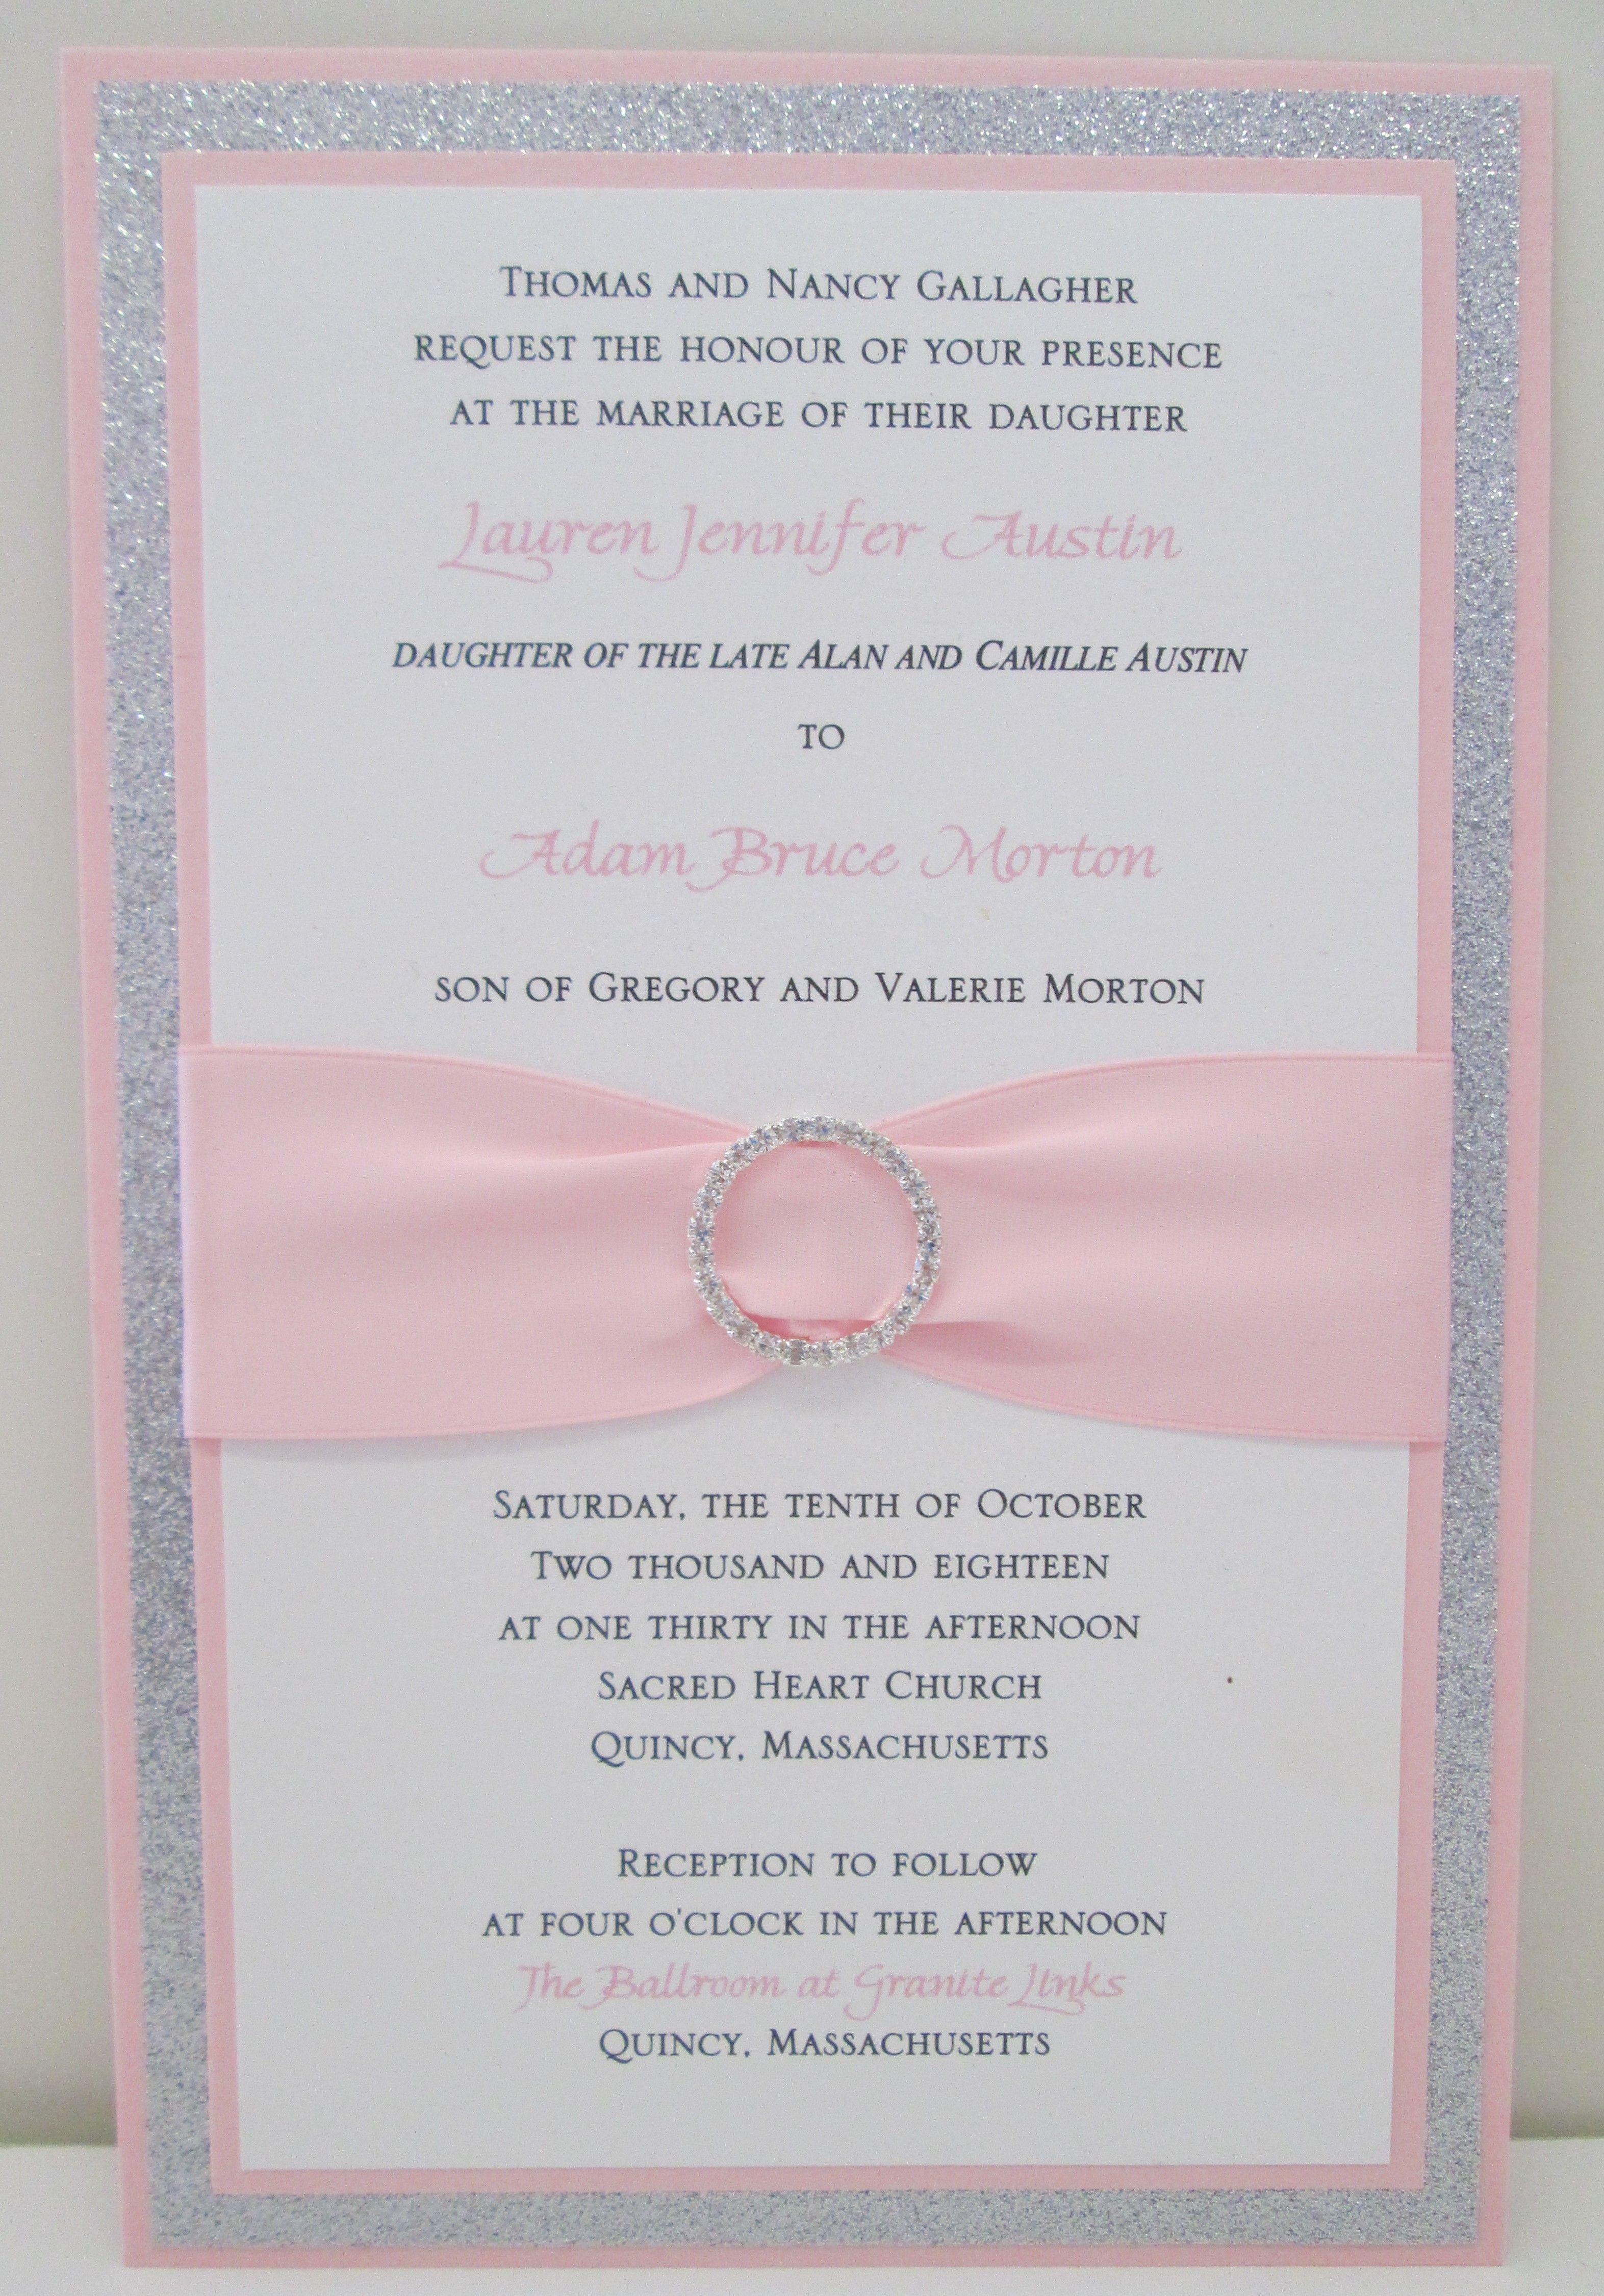 bling wedding invitations Multi Layer wedding invitations with glitter ribbon and rhinestone bling